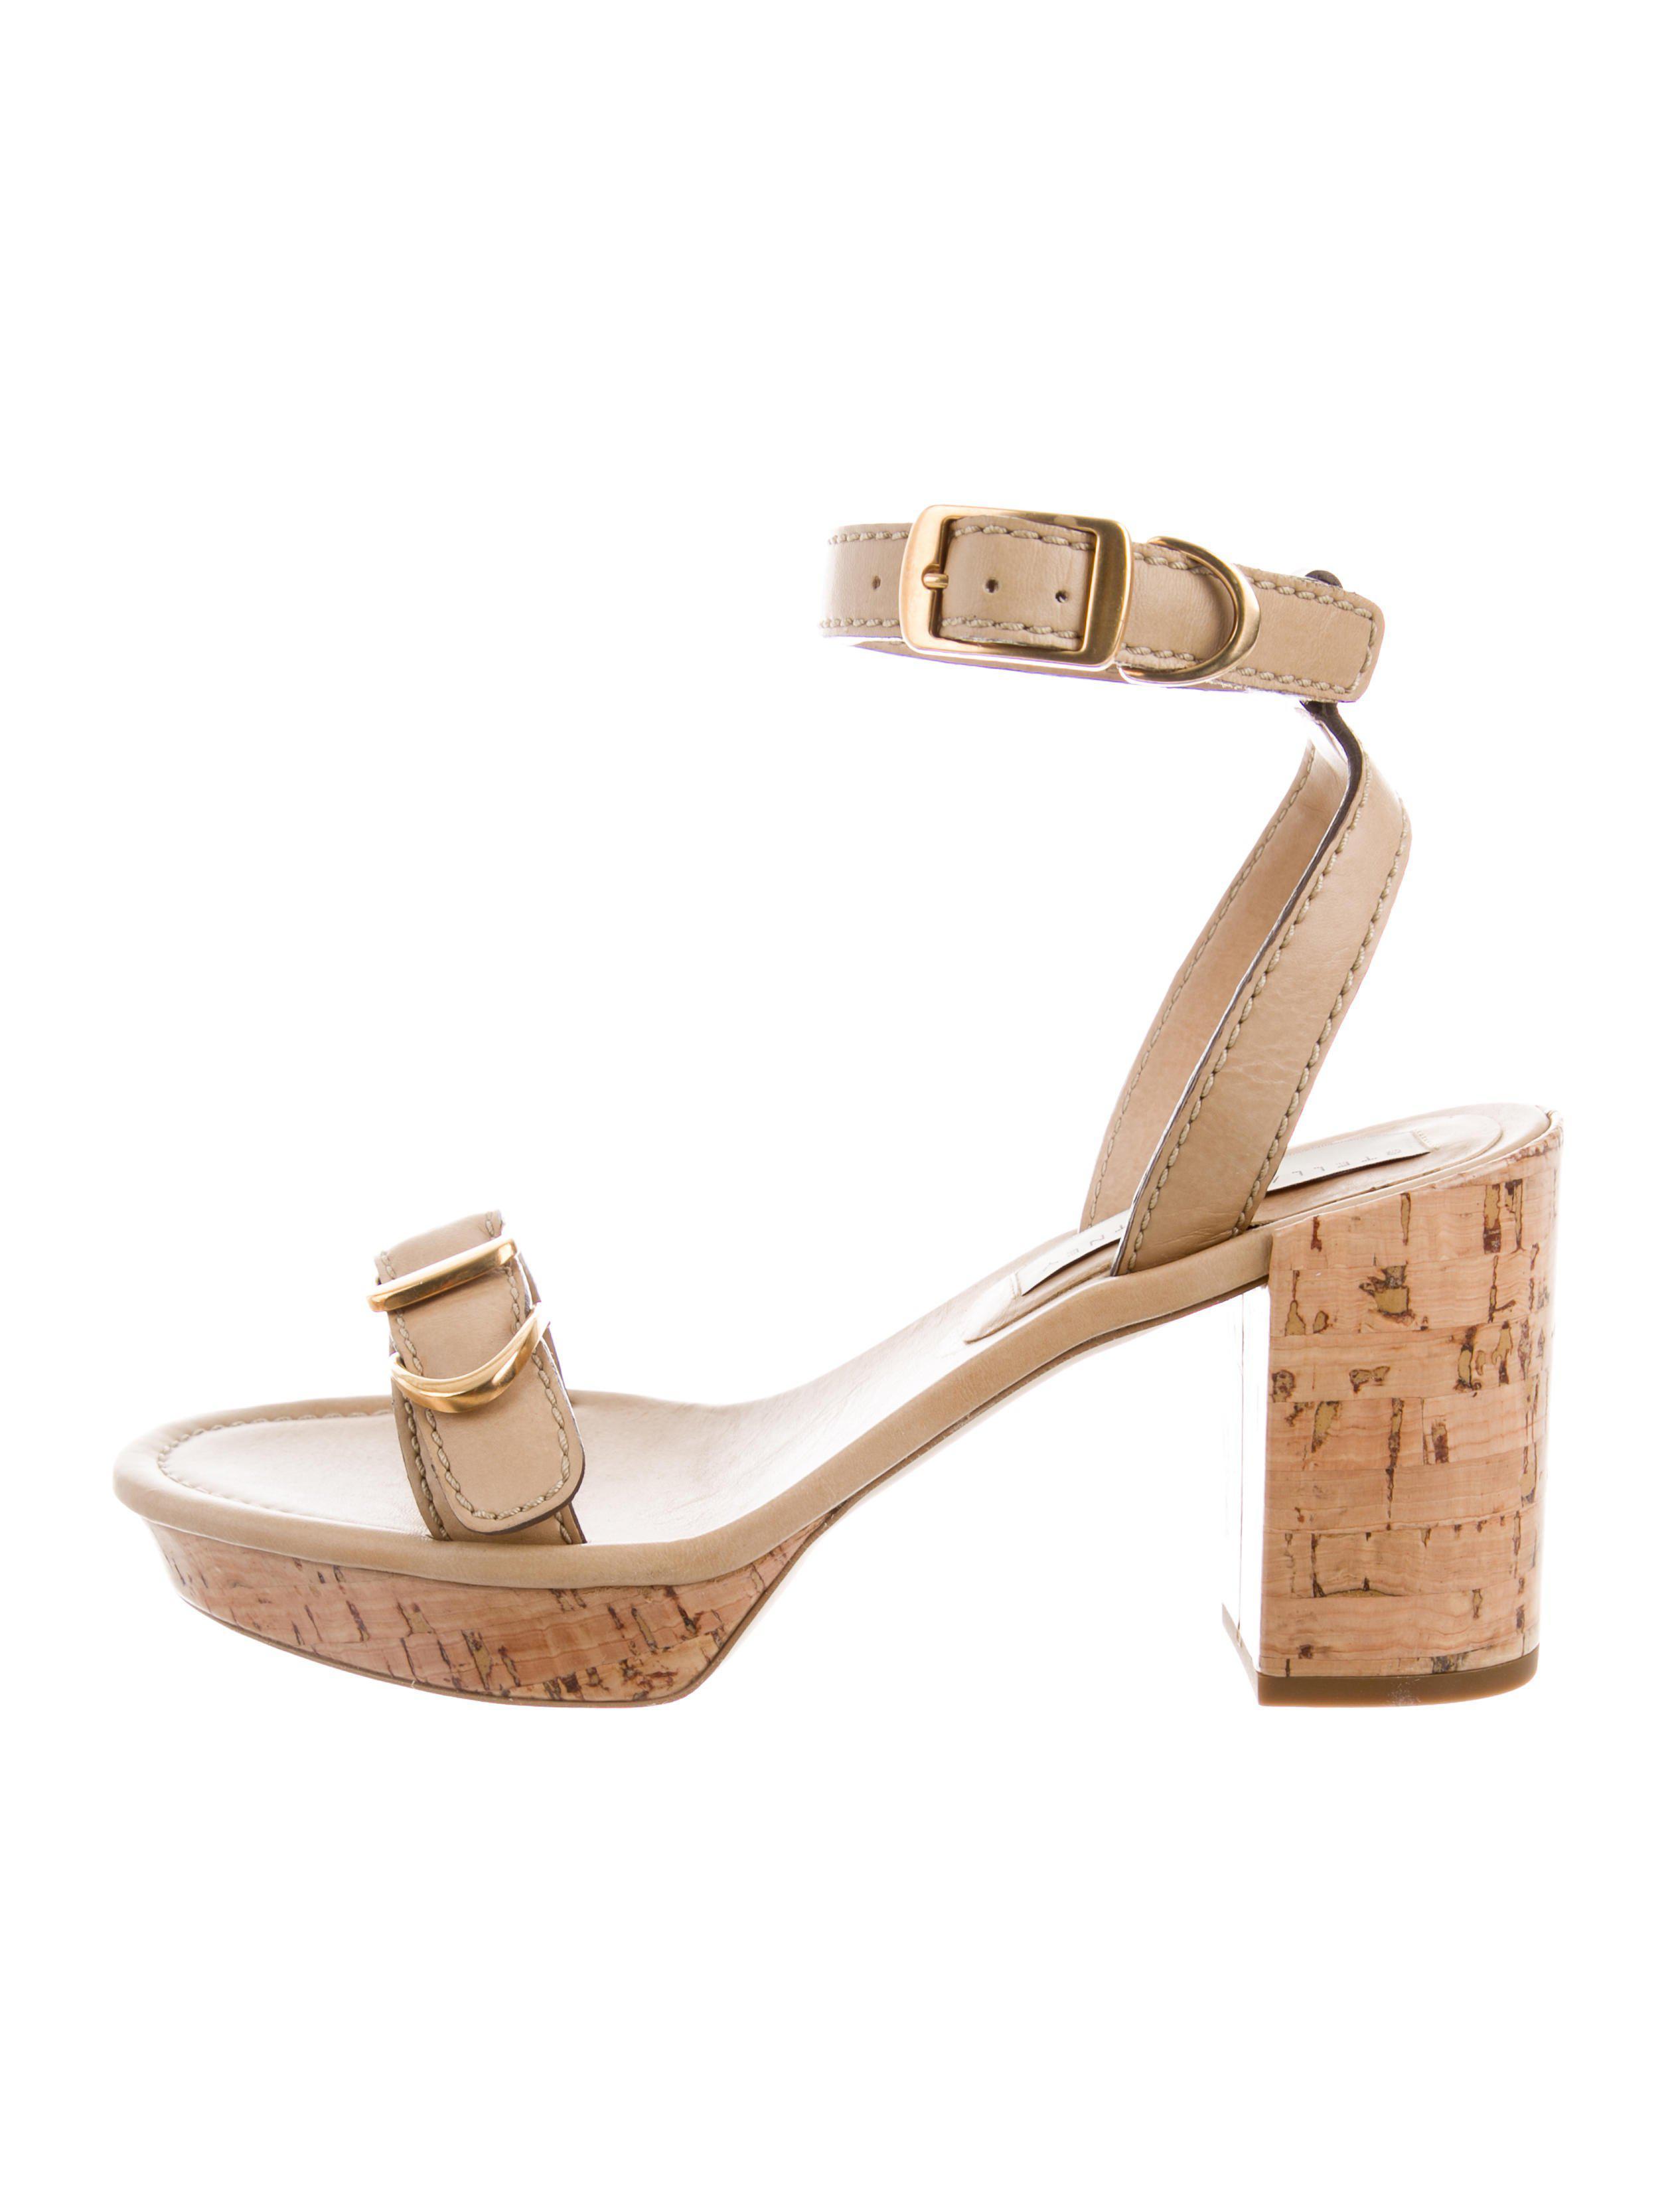 8c4f55a64bc Lyst - Stella Mccartney Ankle-strap Platform Sandals Tan in Metallic